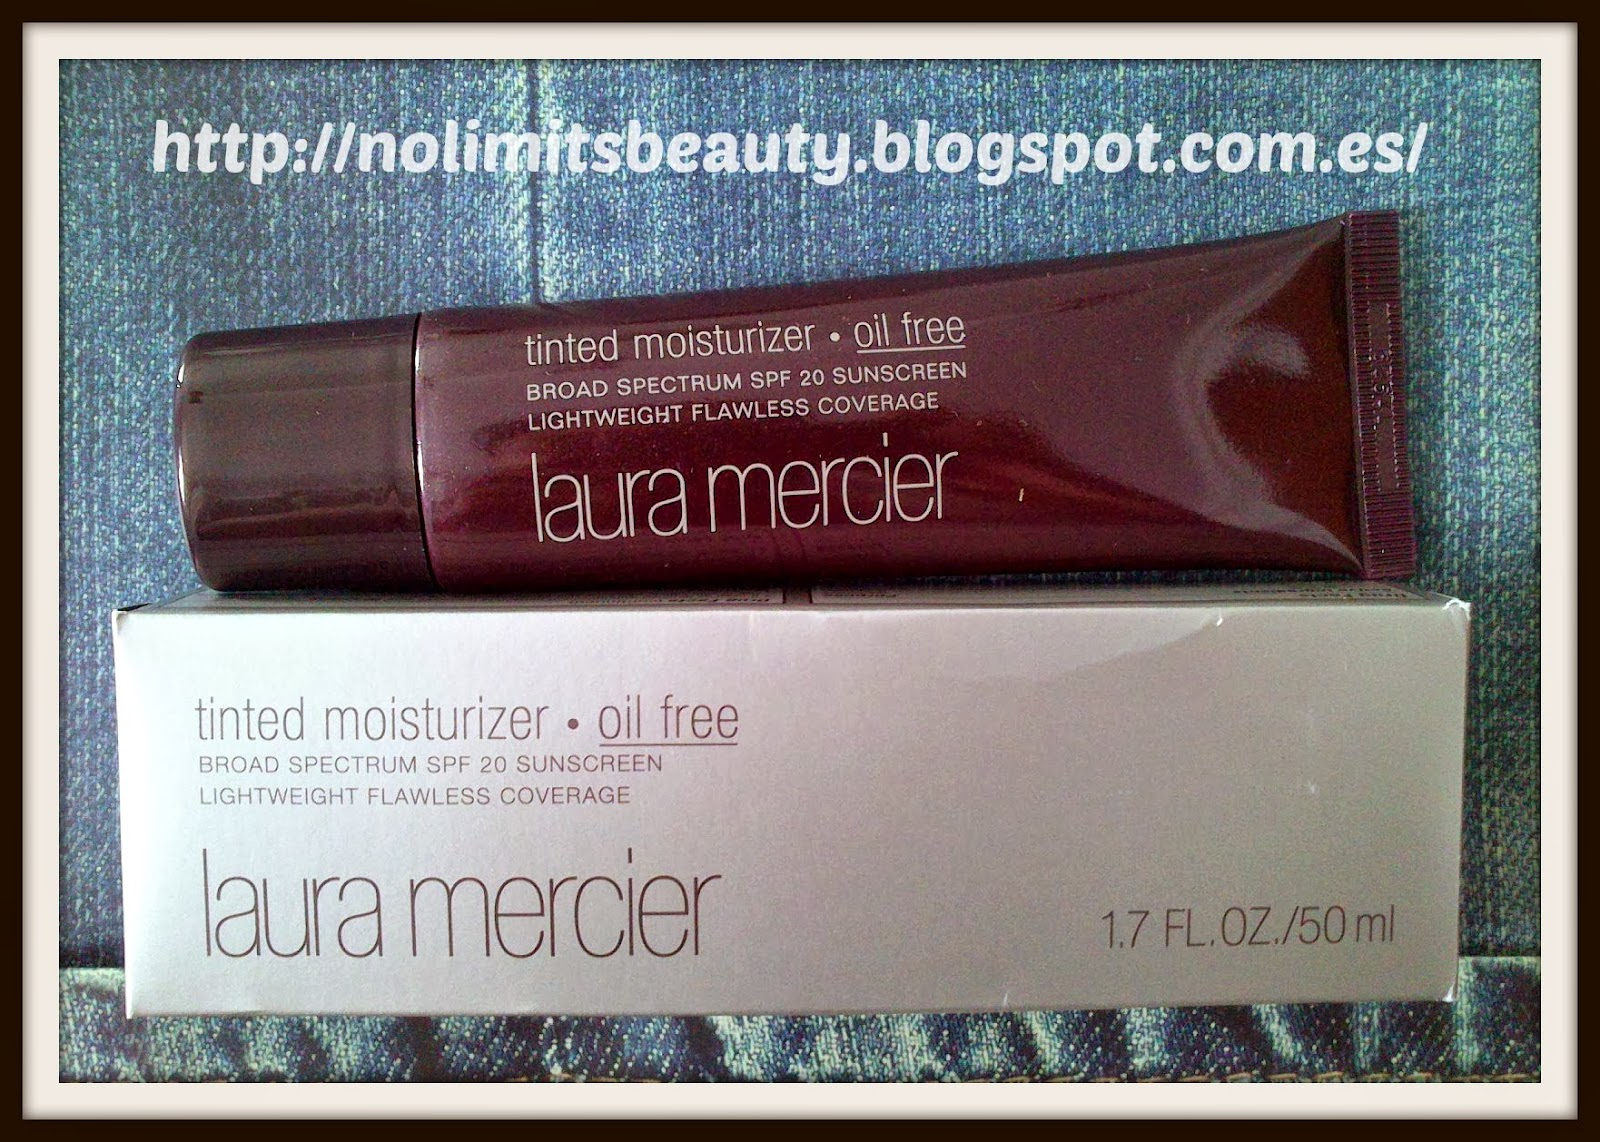 Laura Mercier Tinted Moisturizer Oil Free